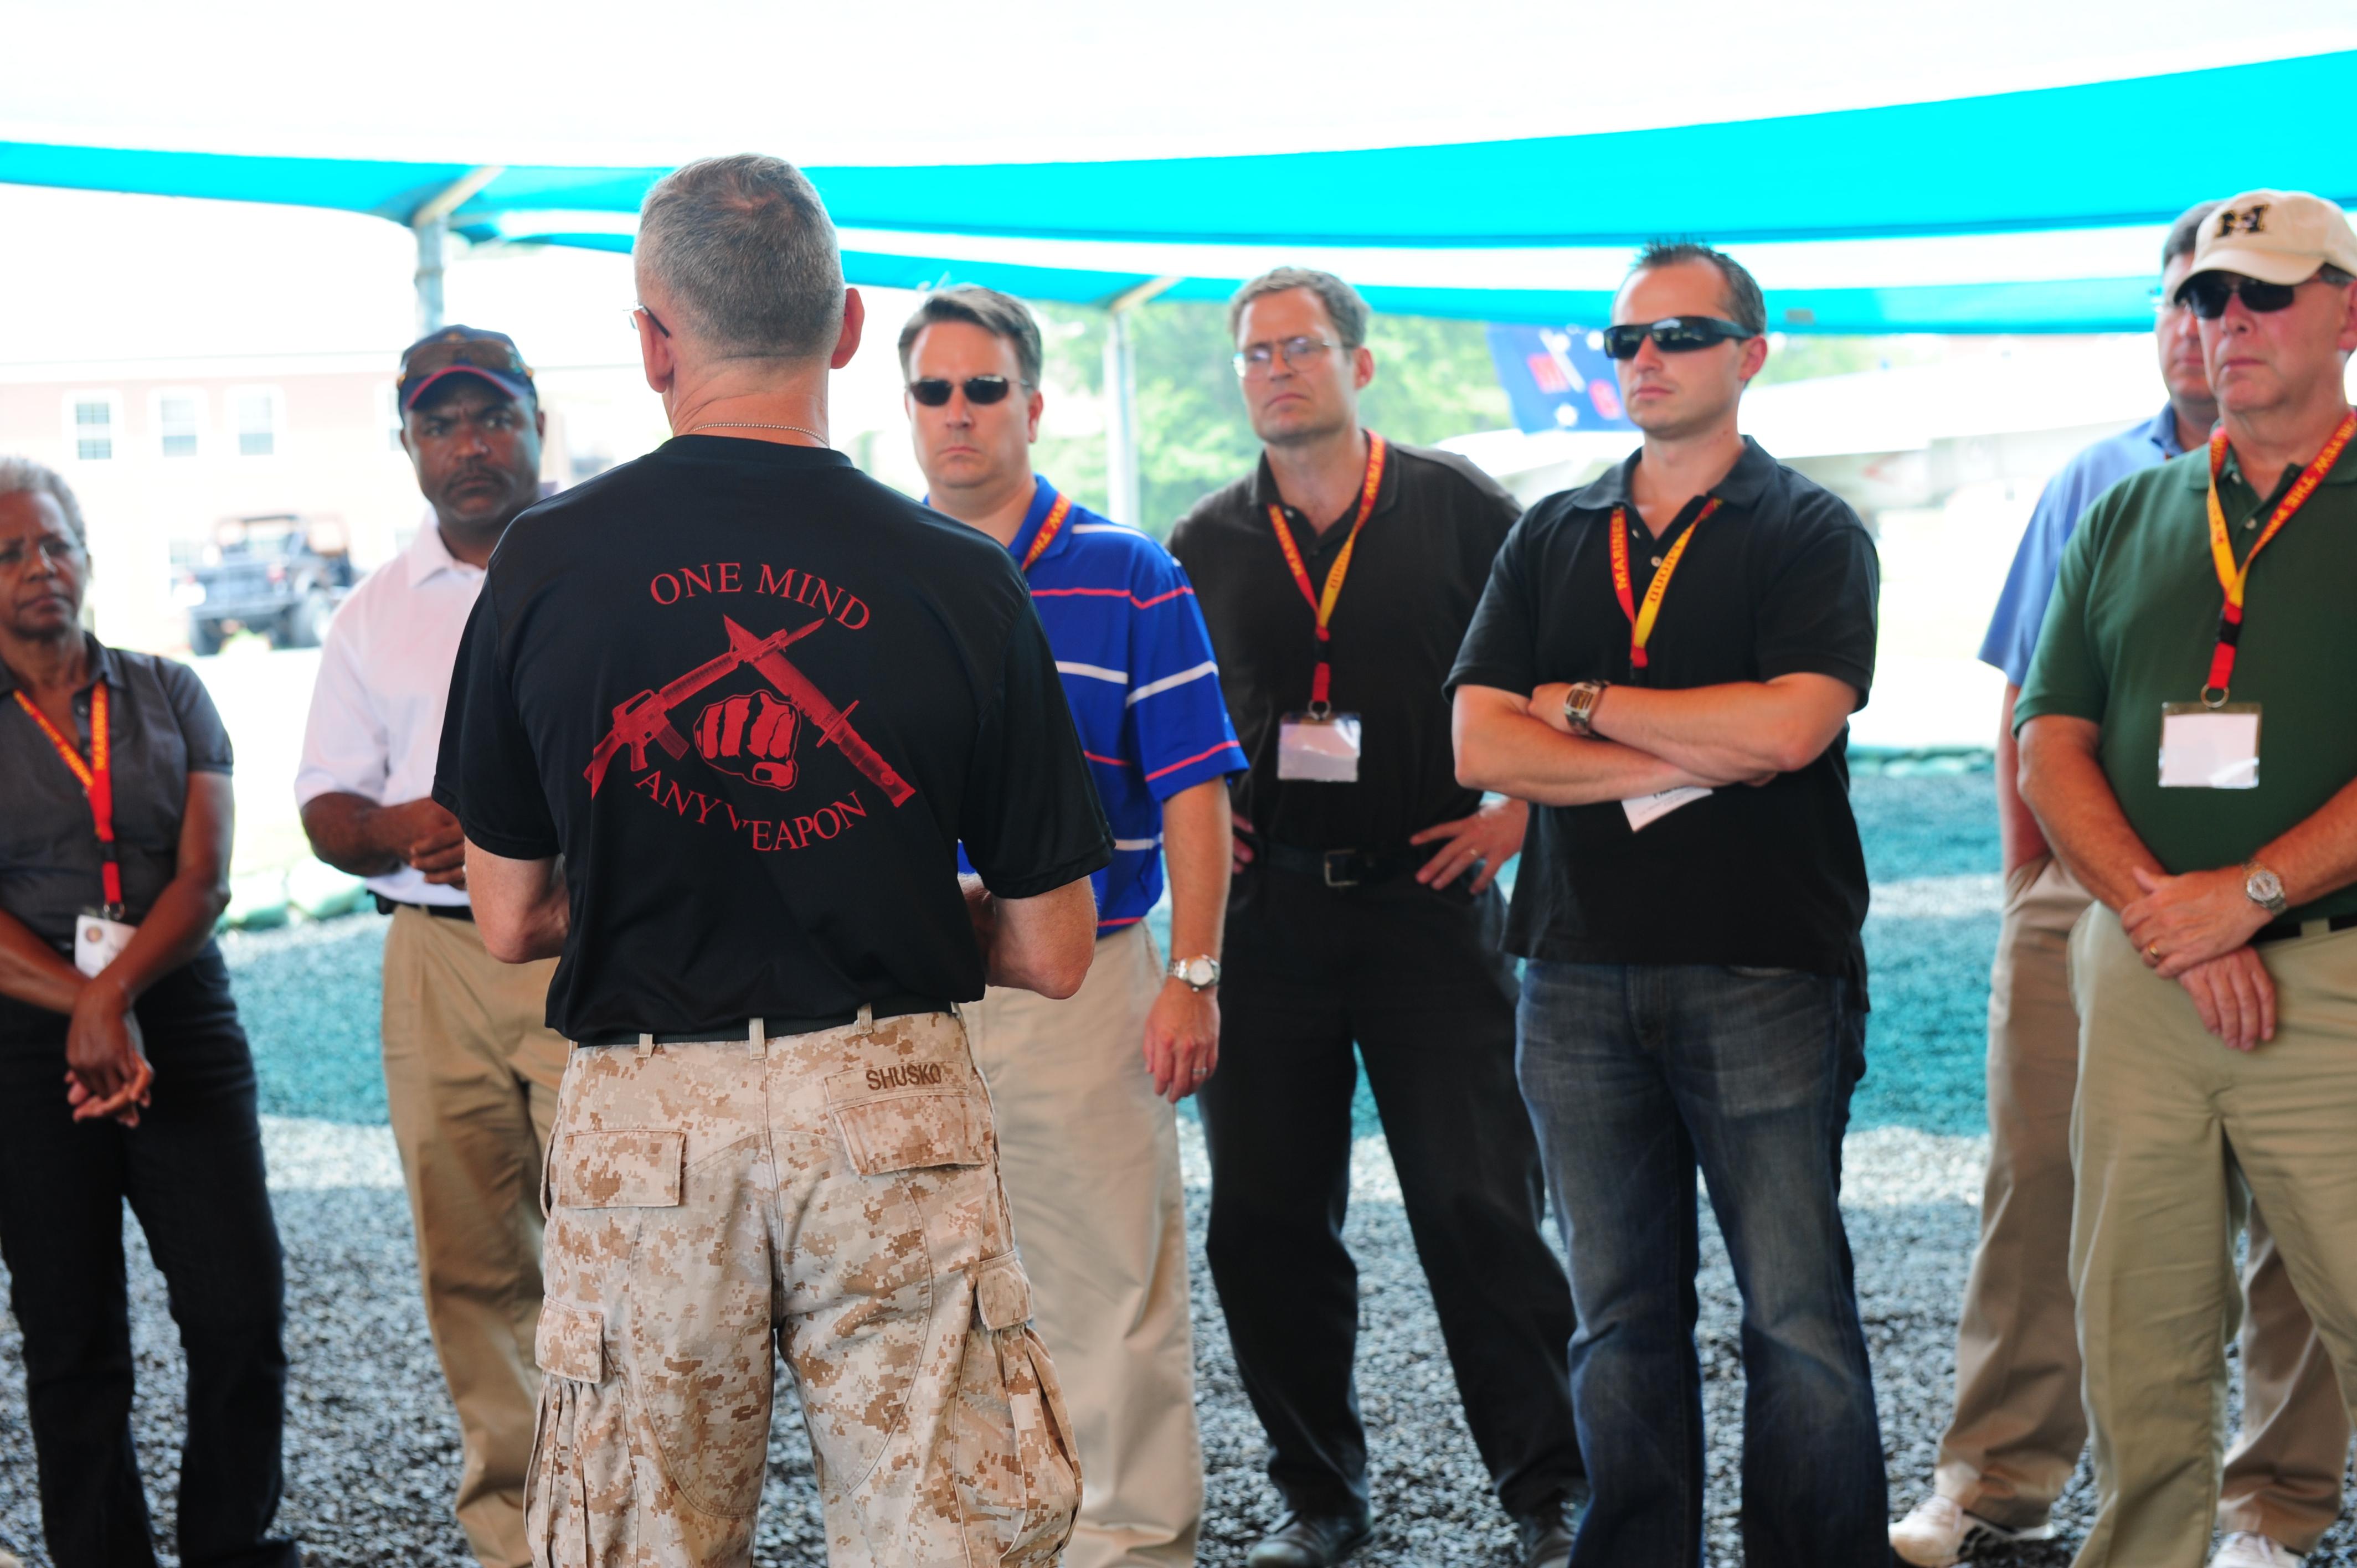 File:Reitred U.S. Marine Lt. Col. Joseph Shusko ...